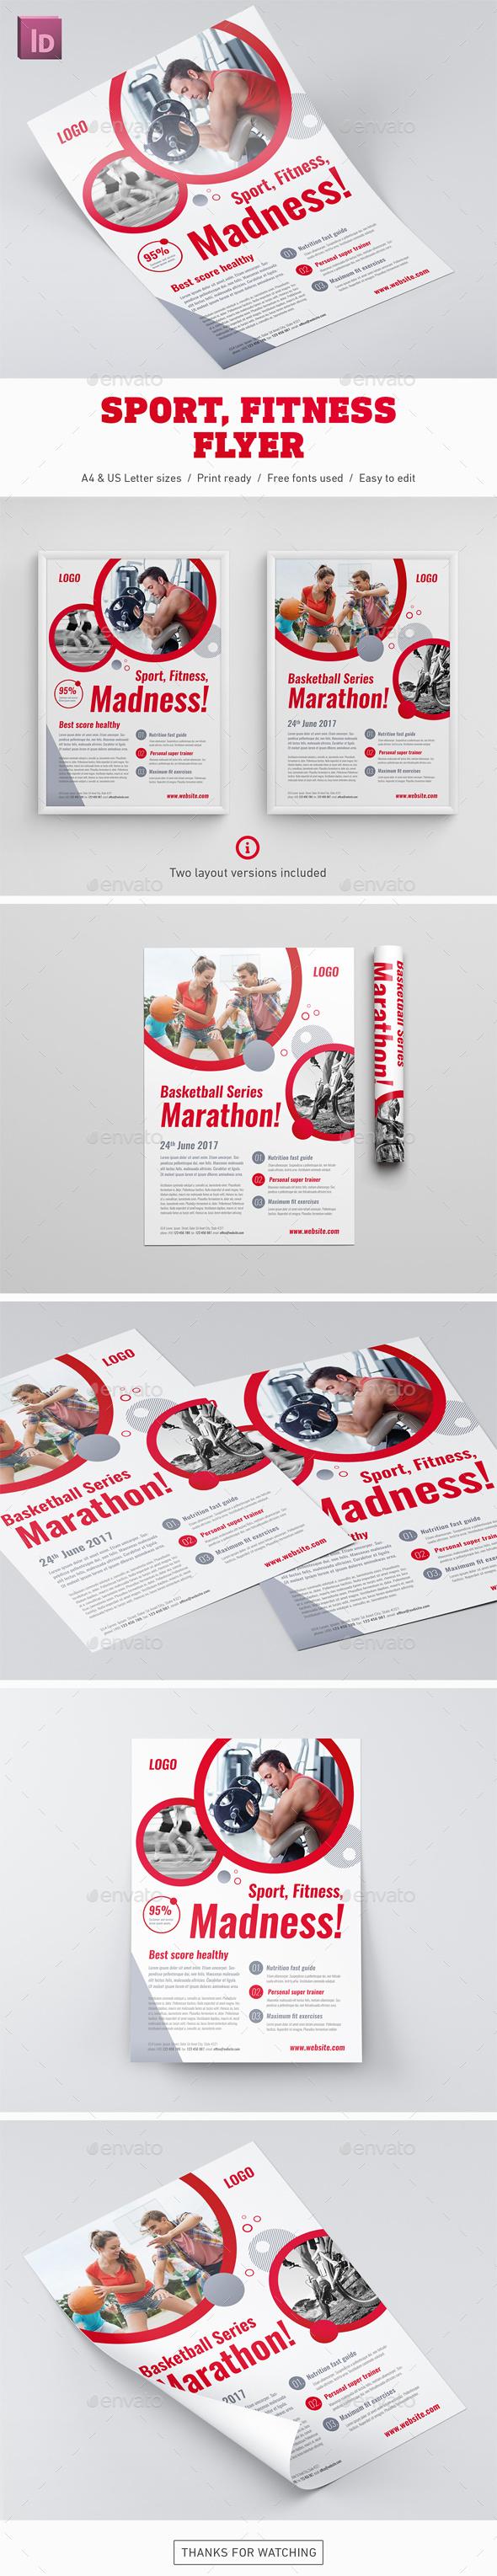 Sport Fitness Flyer